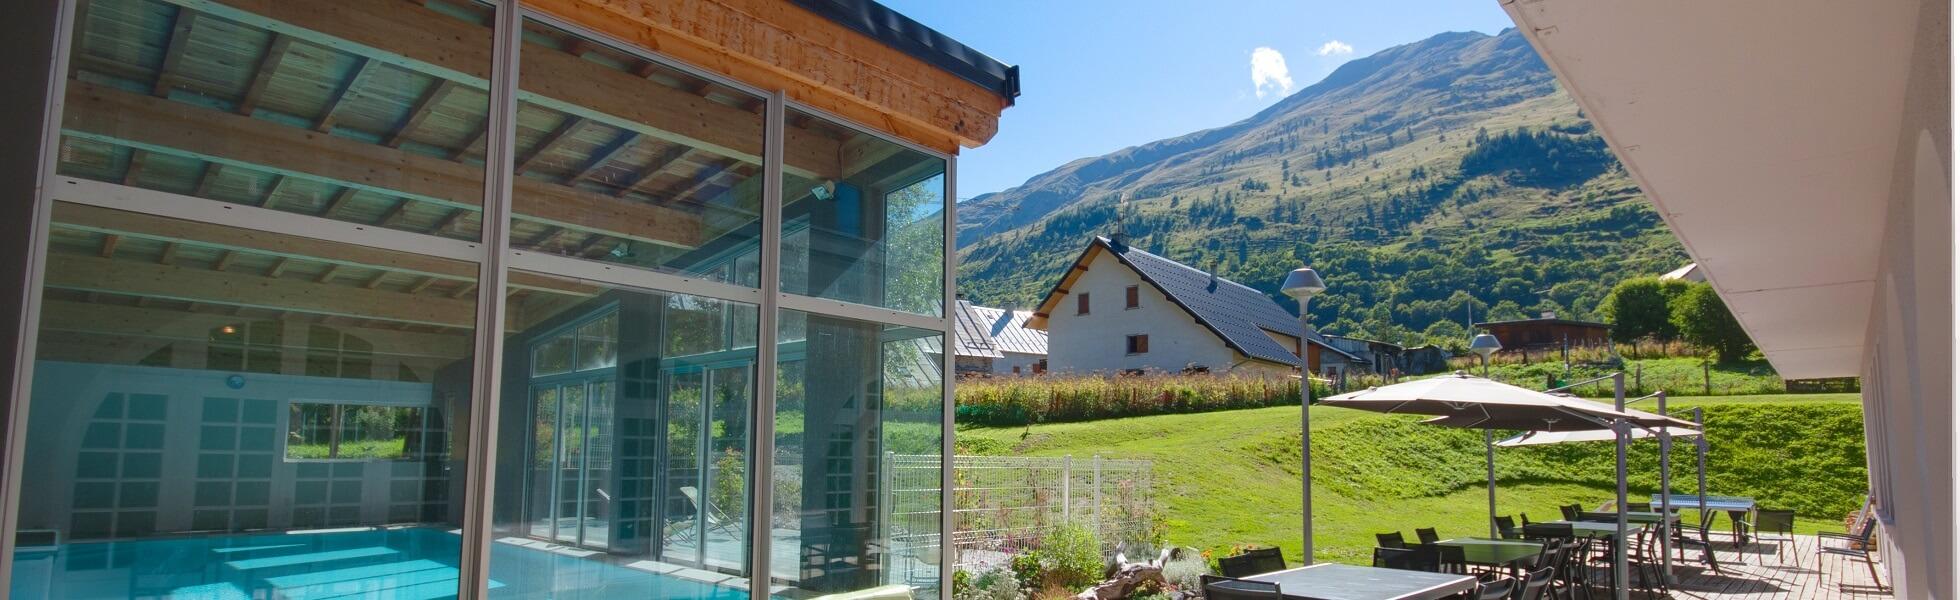 La Pulka Galibier – Valloire / Savoie